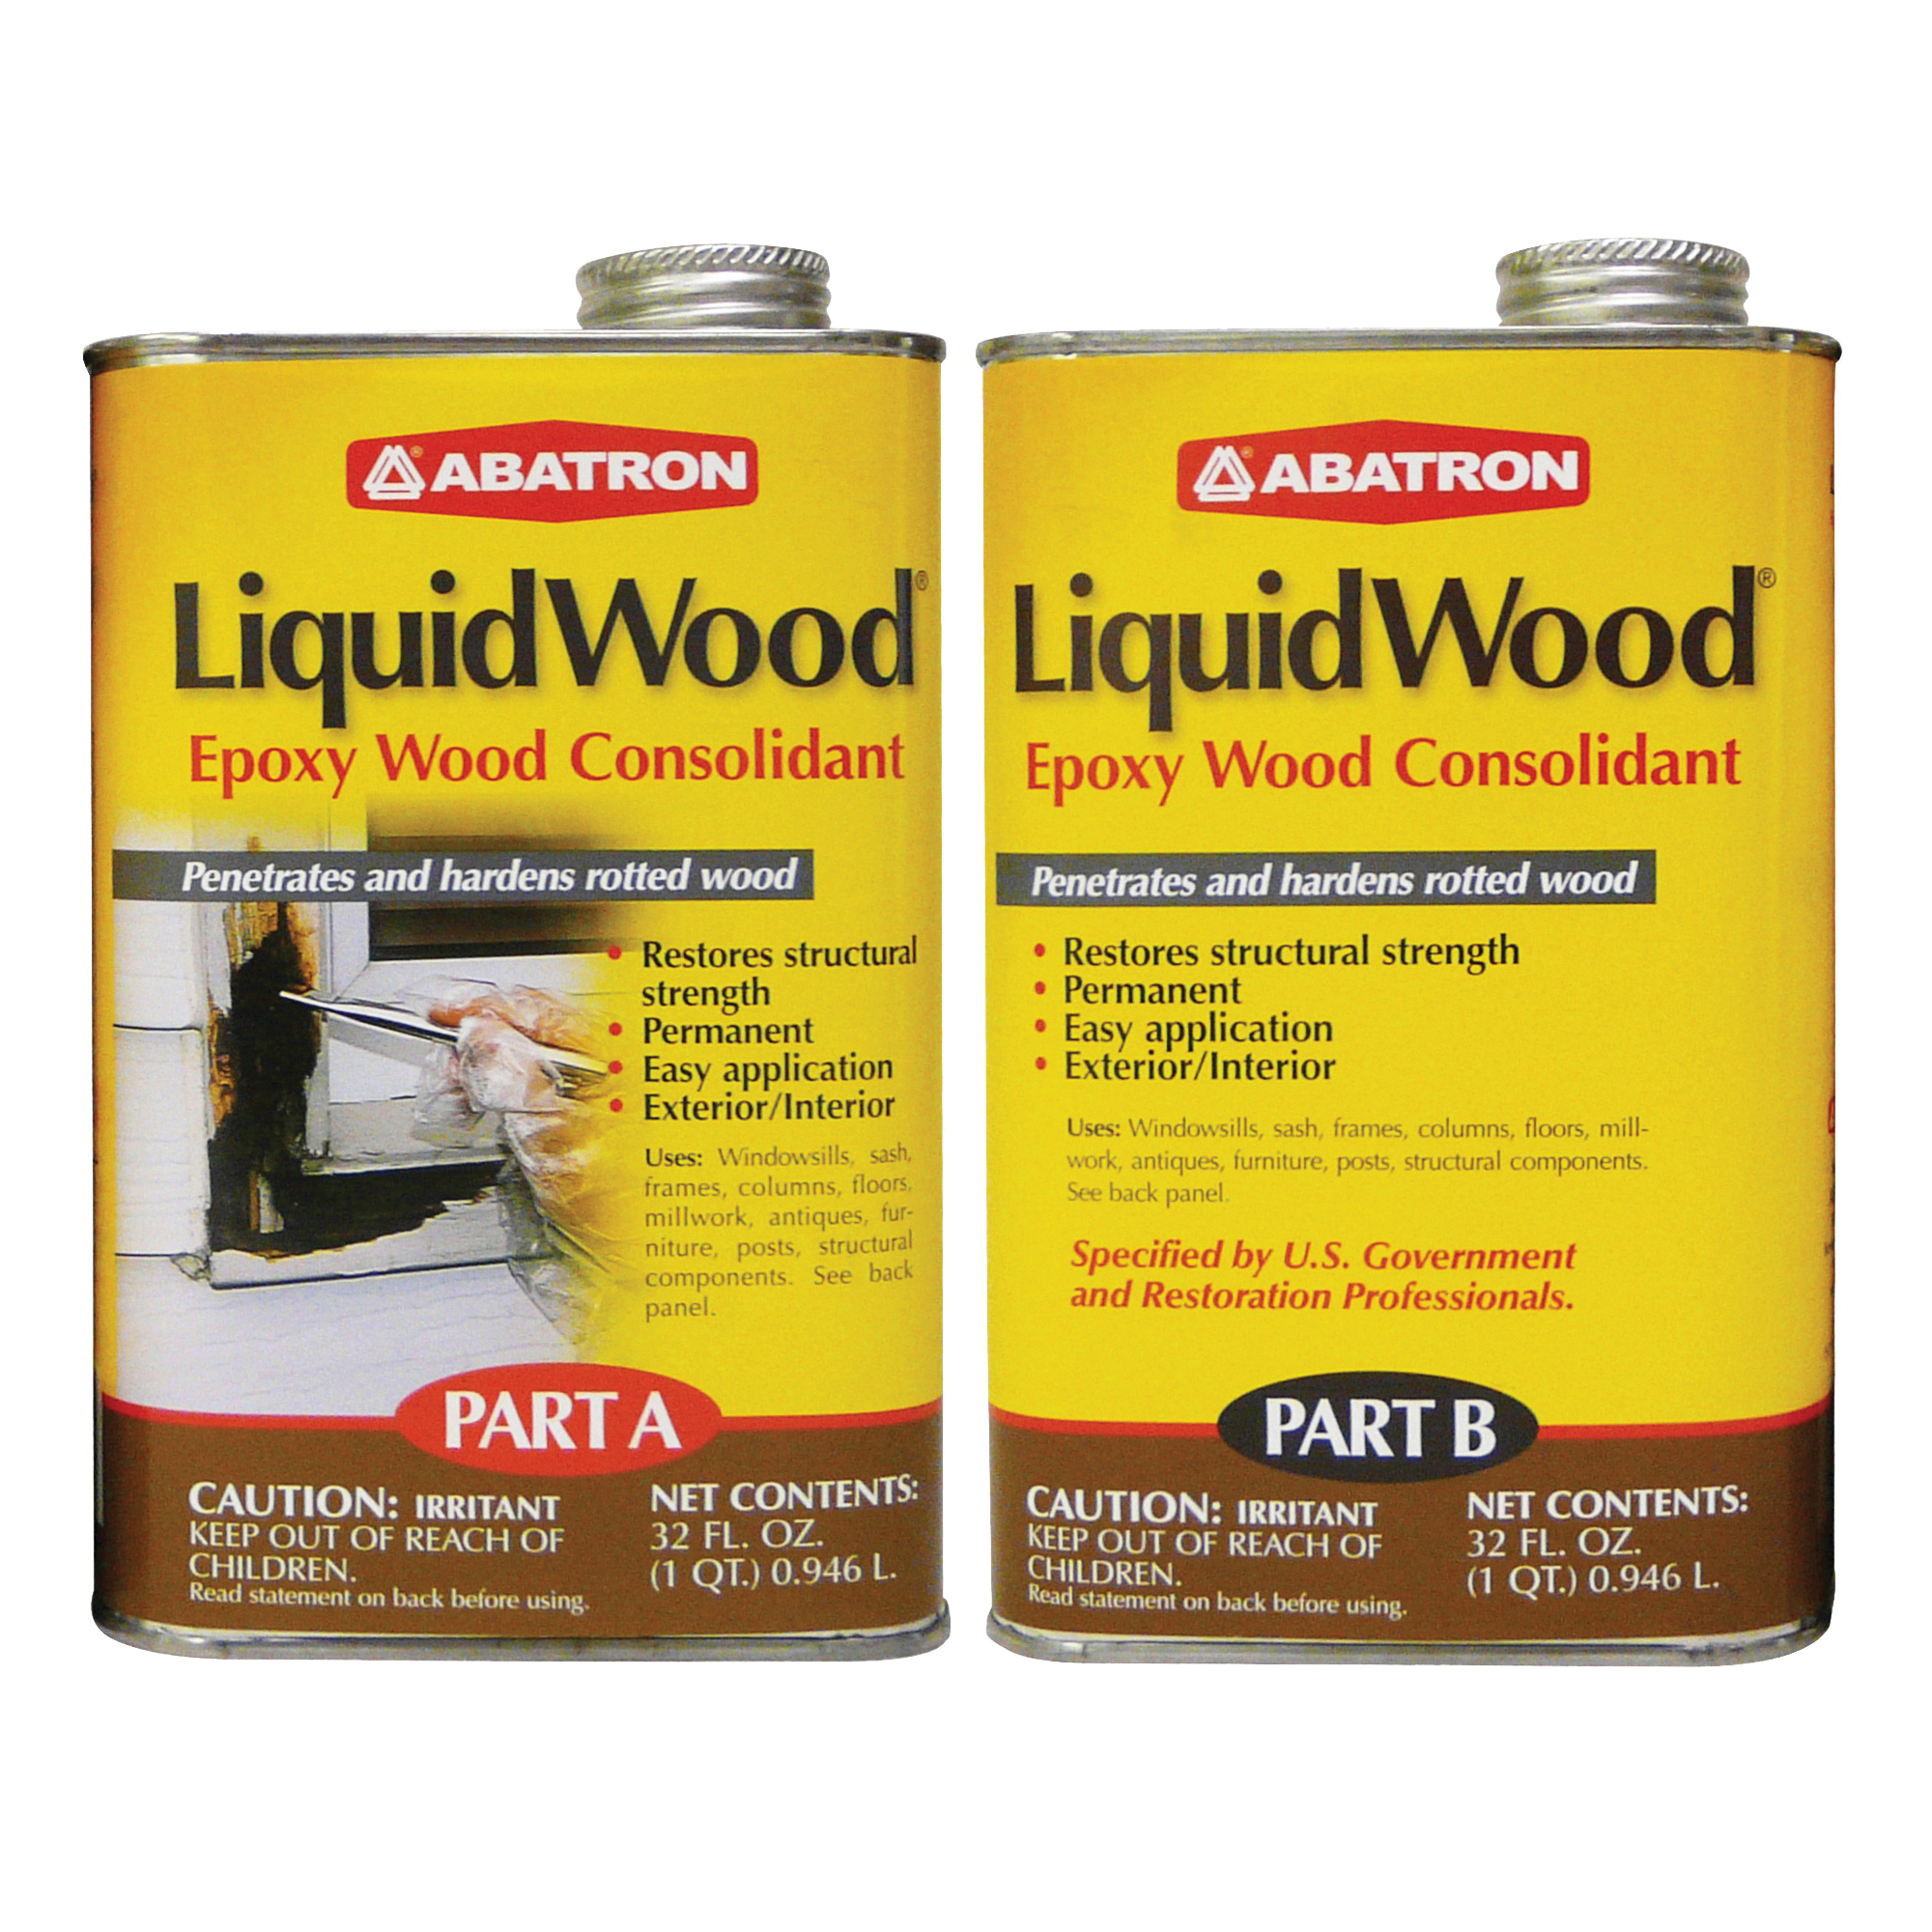 Picture of ABATRON LiquidWood LW2QKR Wood Filler, Liquid, Faint, Slightly Aromatic Part A, Irritating Ammonia Part B, Clear